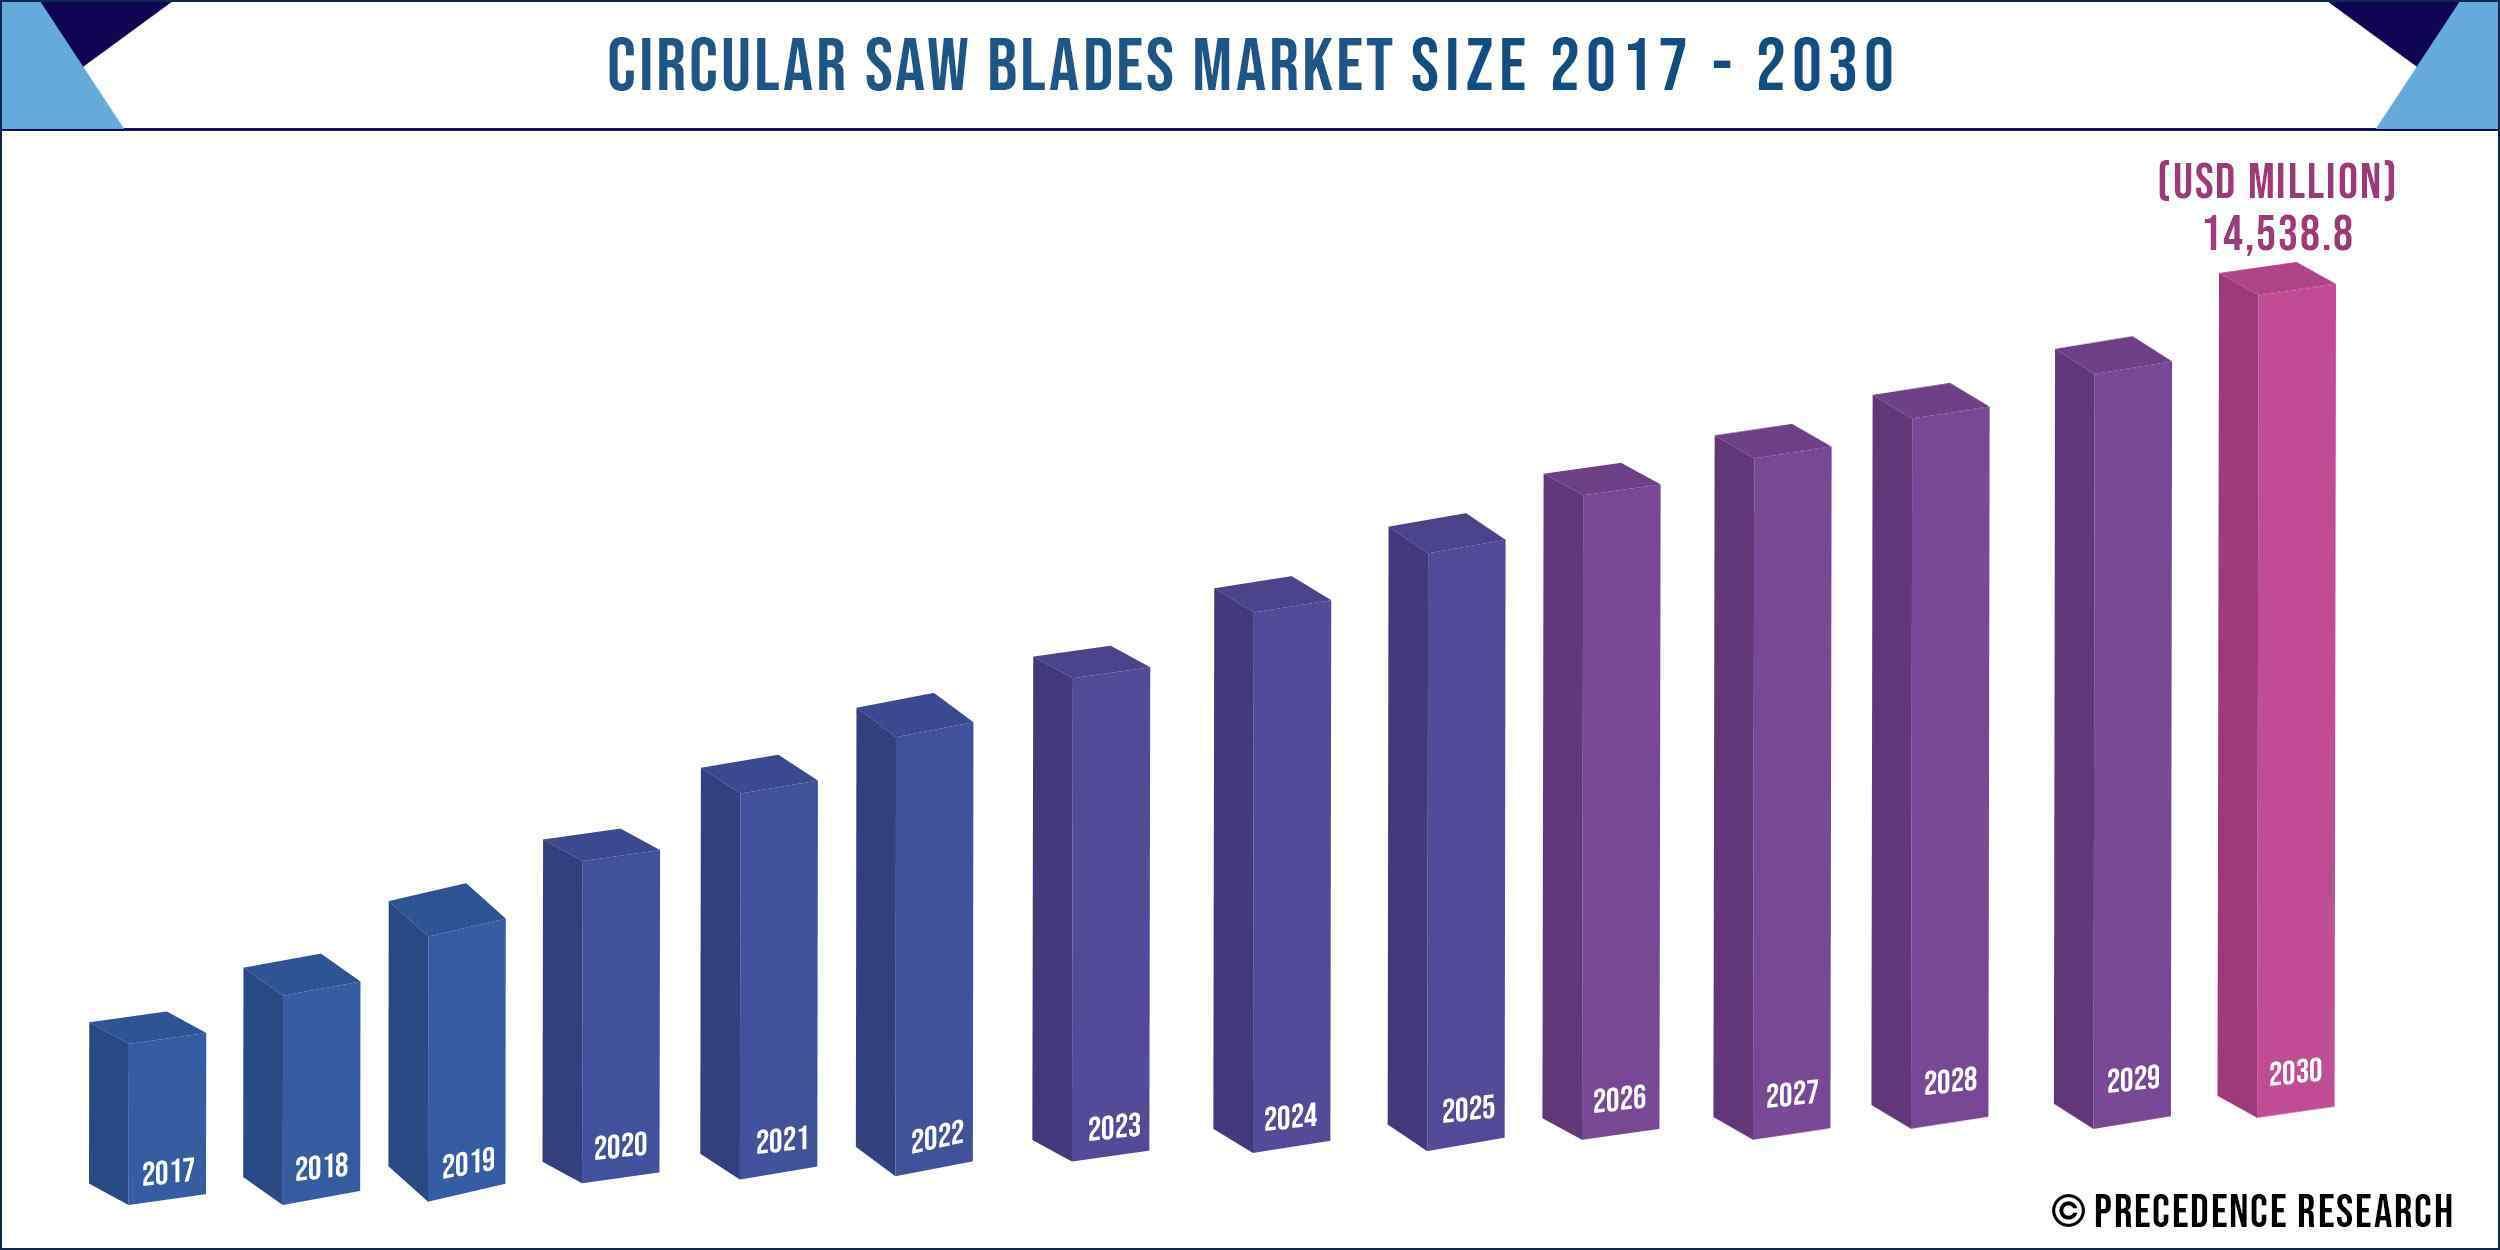 Circular Saw Blades Market Size 2017 to 2030